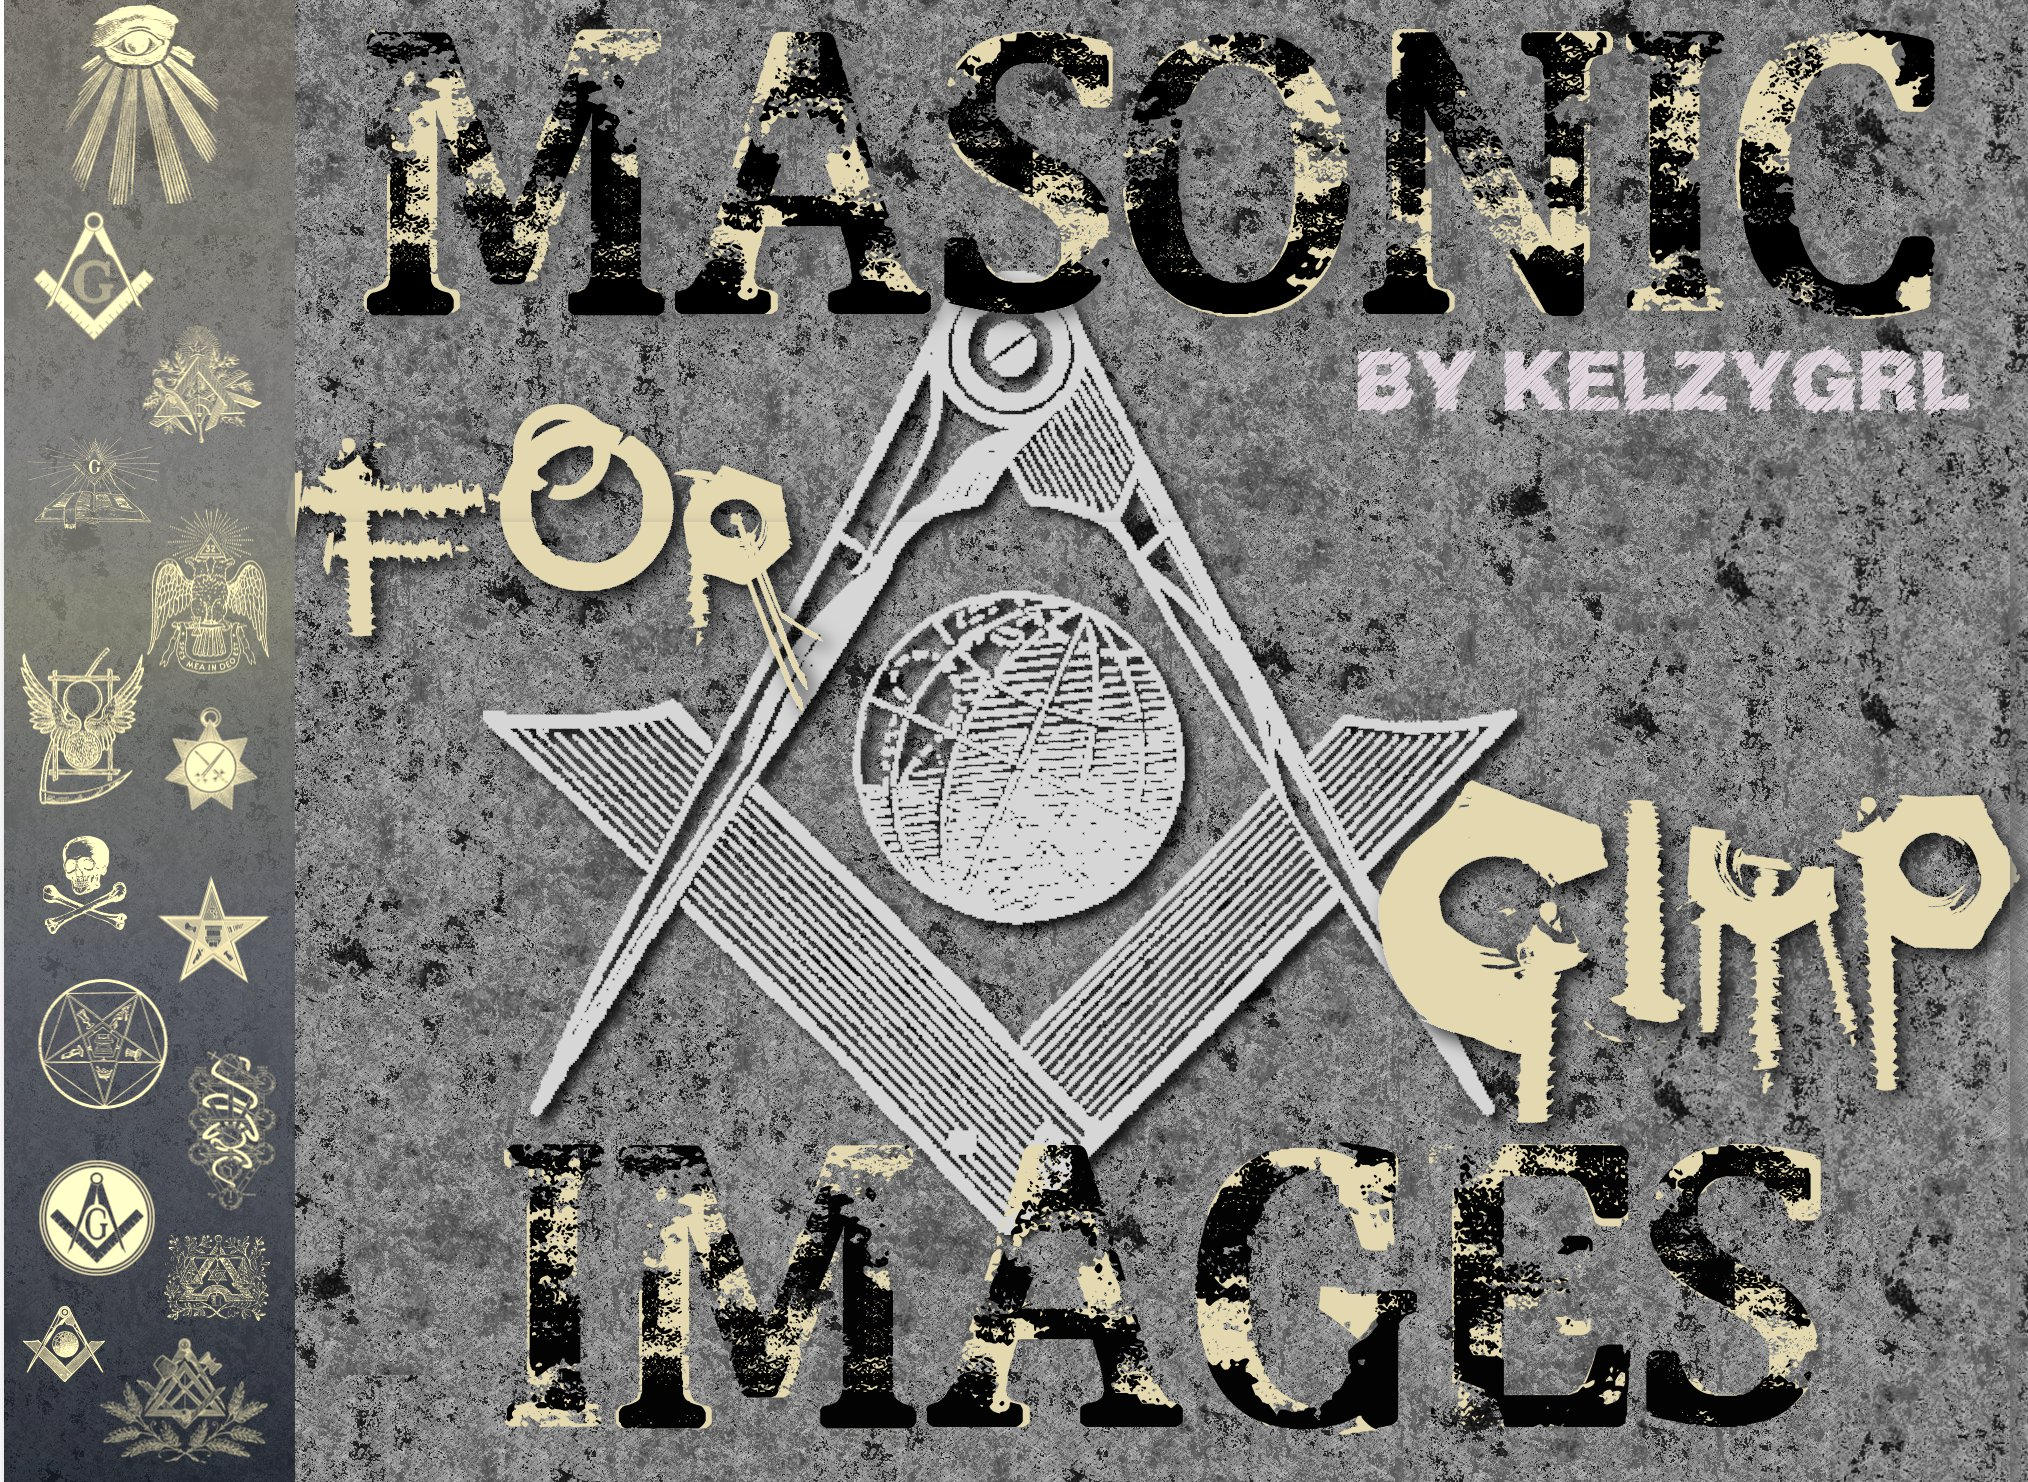 Masonic Images by kelzygrl